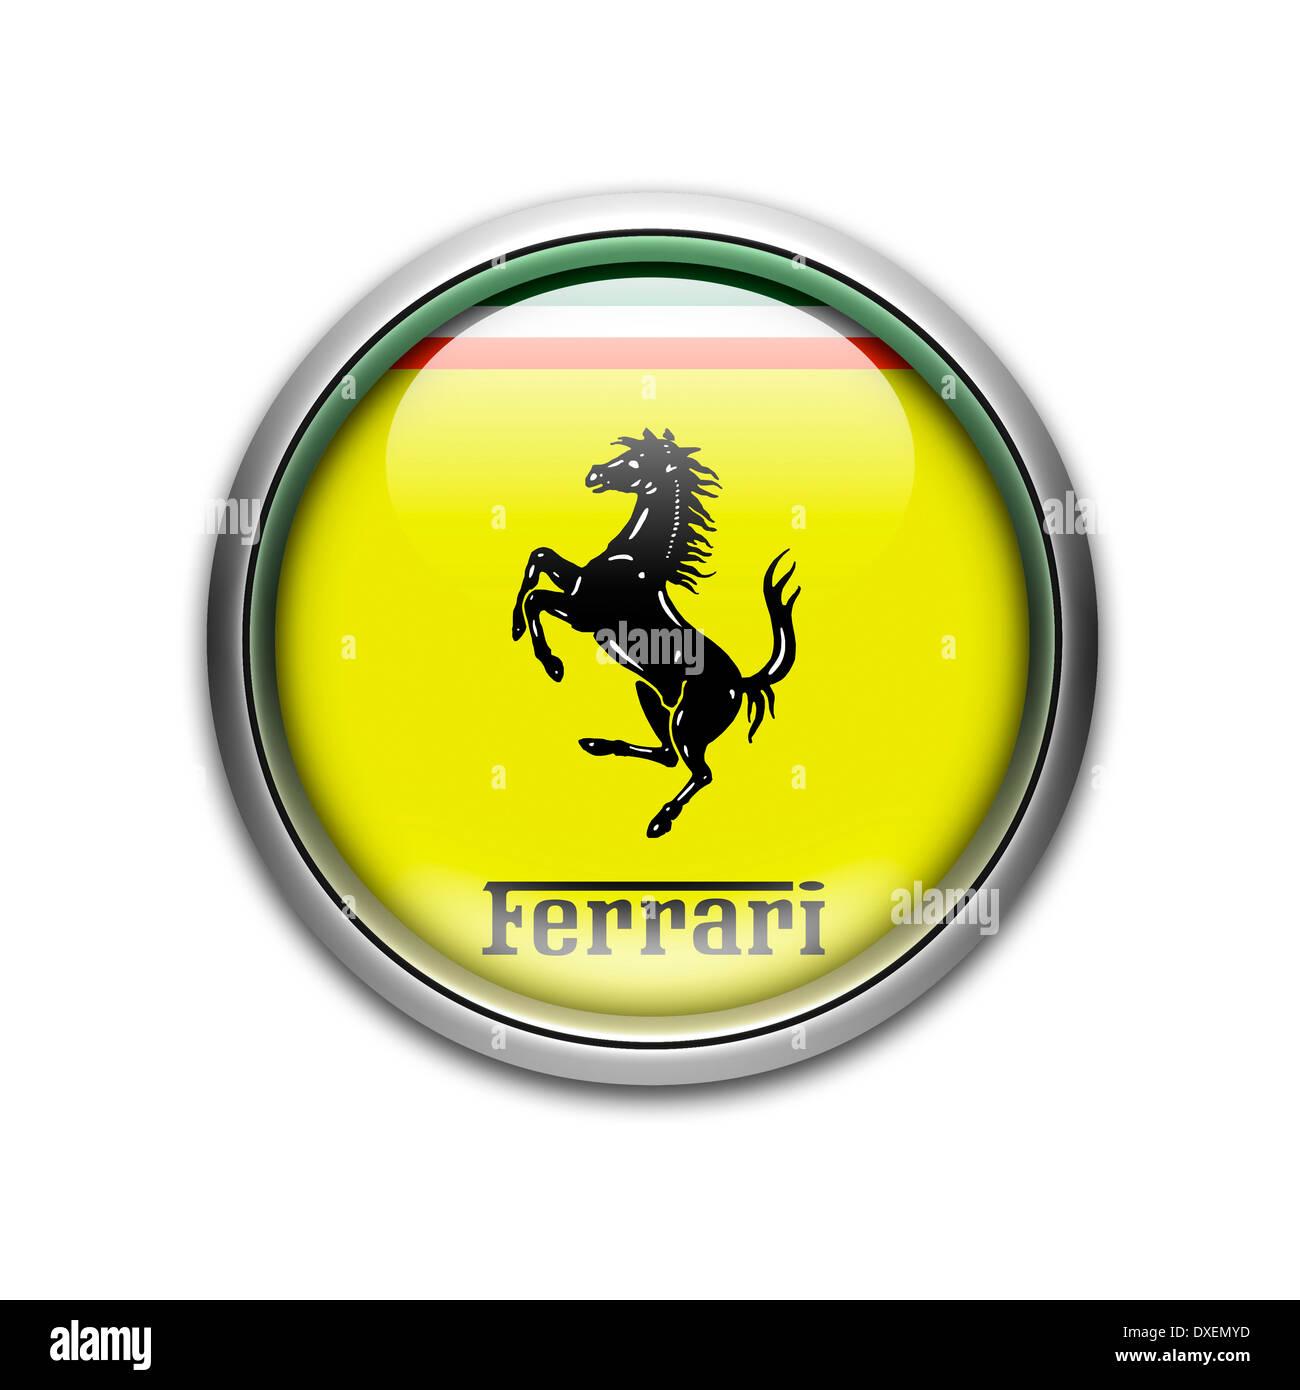 Ferrari Logo Flag Symbol Icon Emblem Stock Photo Alamy